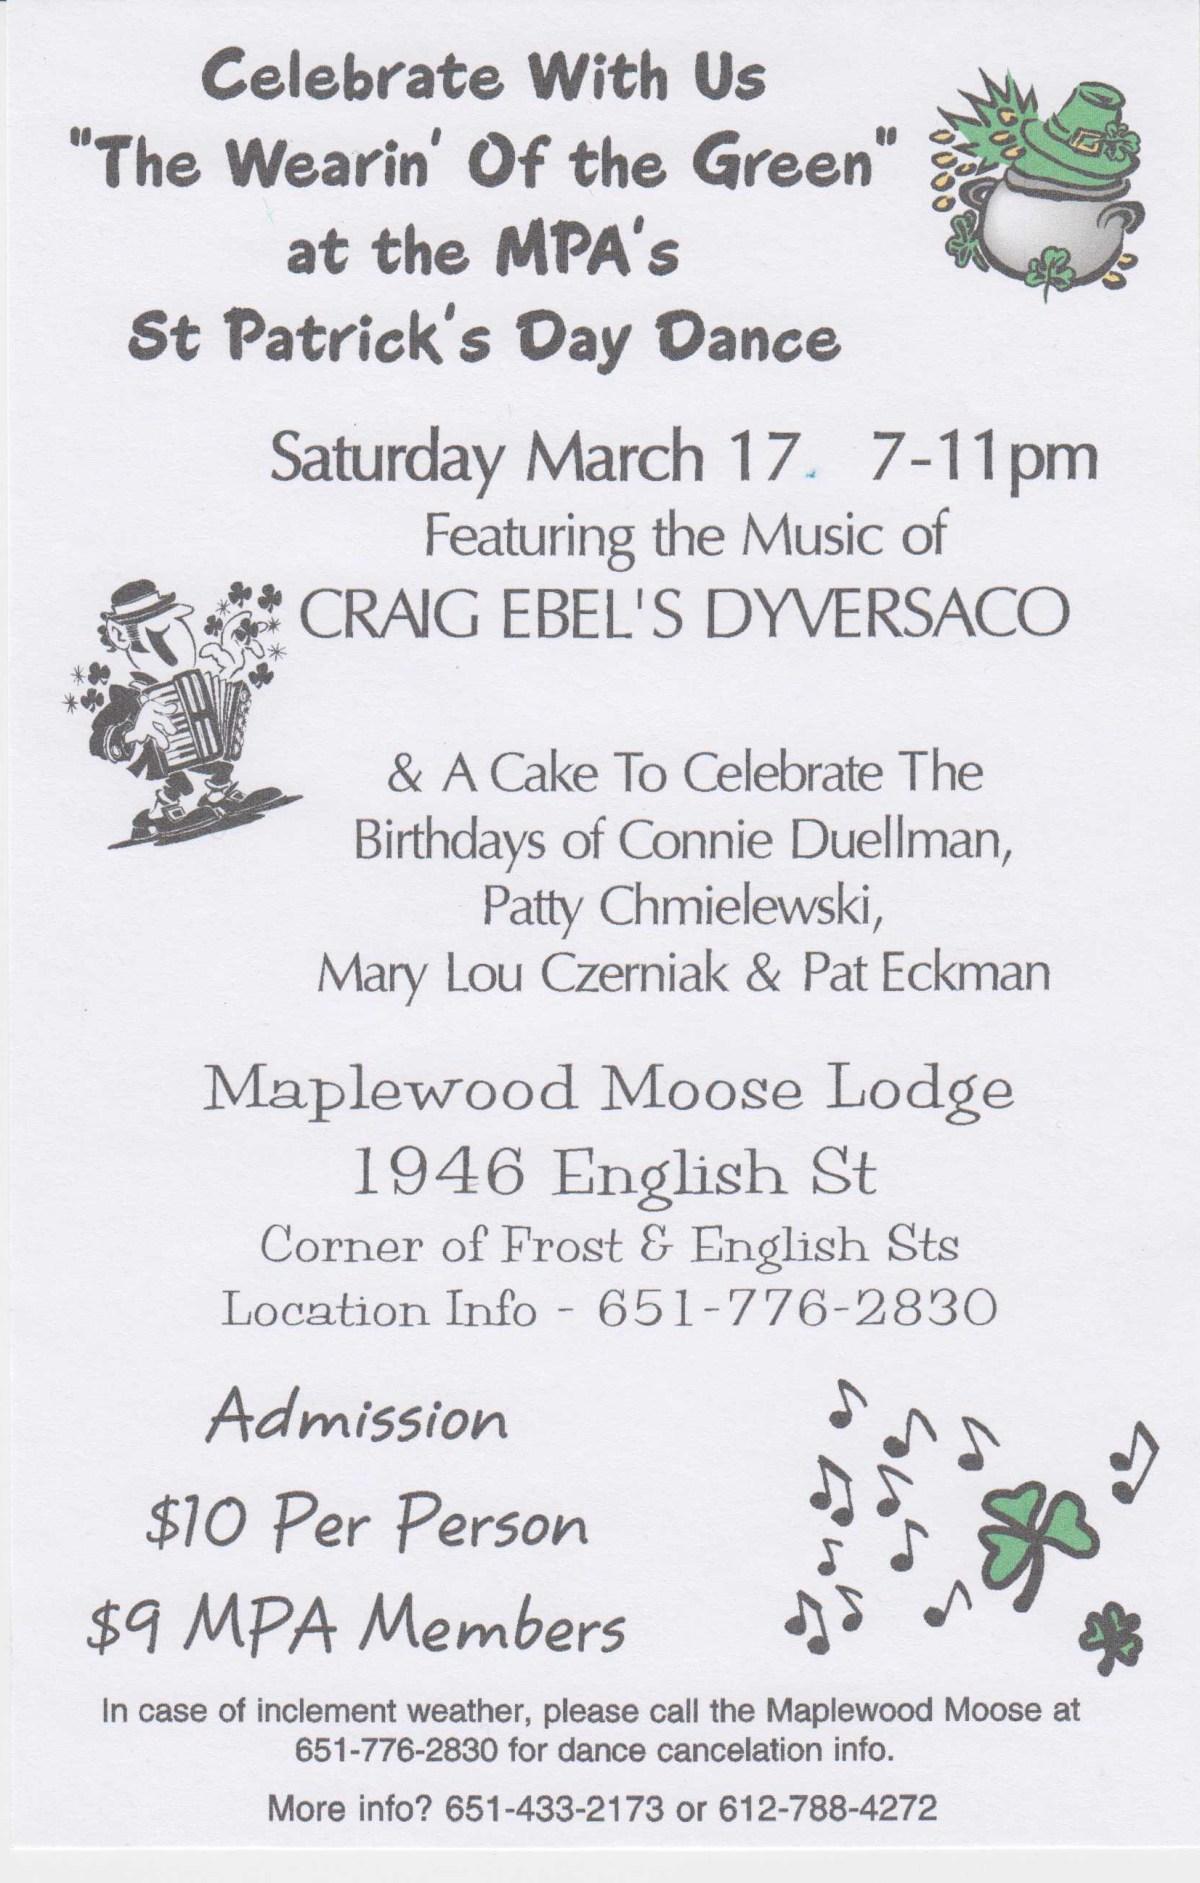 St. Patricks Day Dance - Maplewood Moose Lodge - Maplewood MN